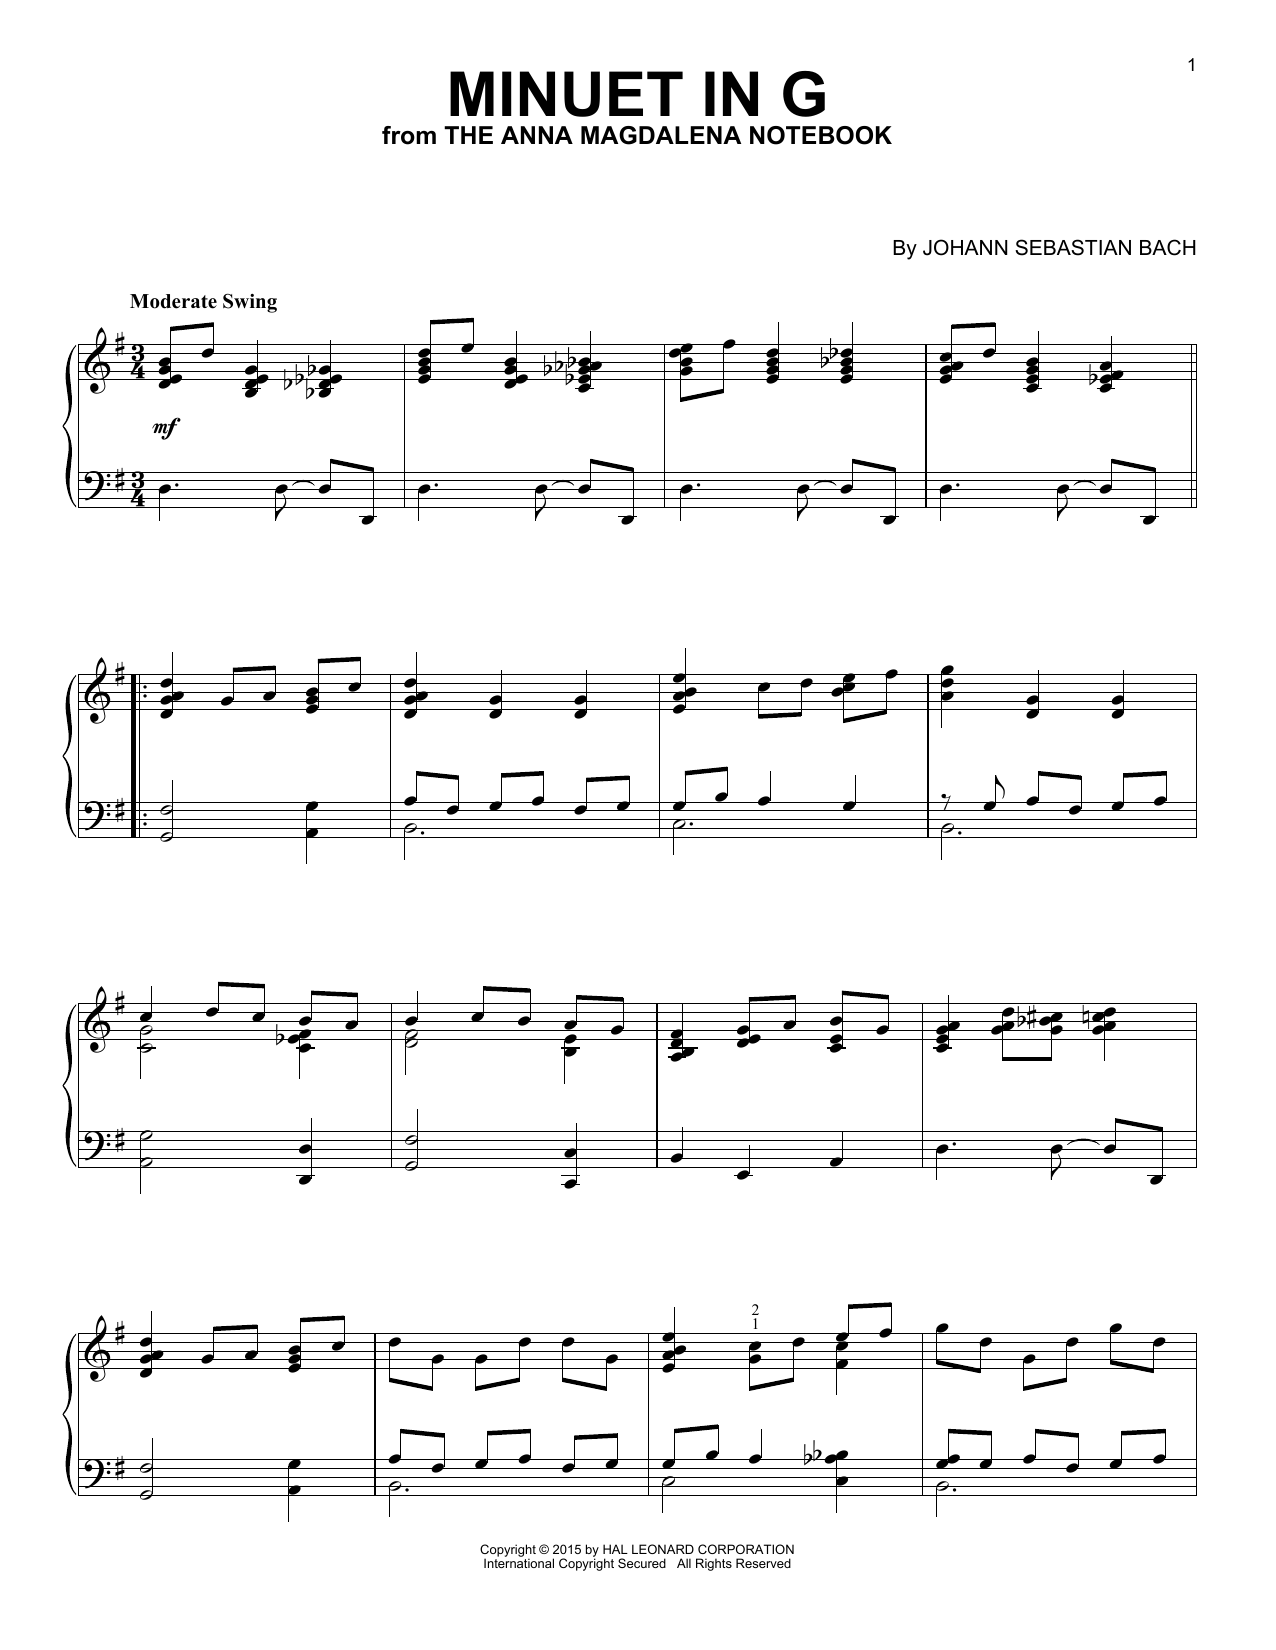 Johann Sebastian Bach Minuet In G [Jazz version] sheet music notes and chords